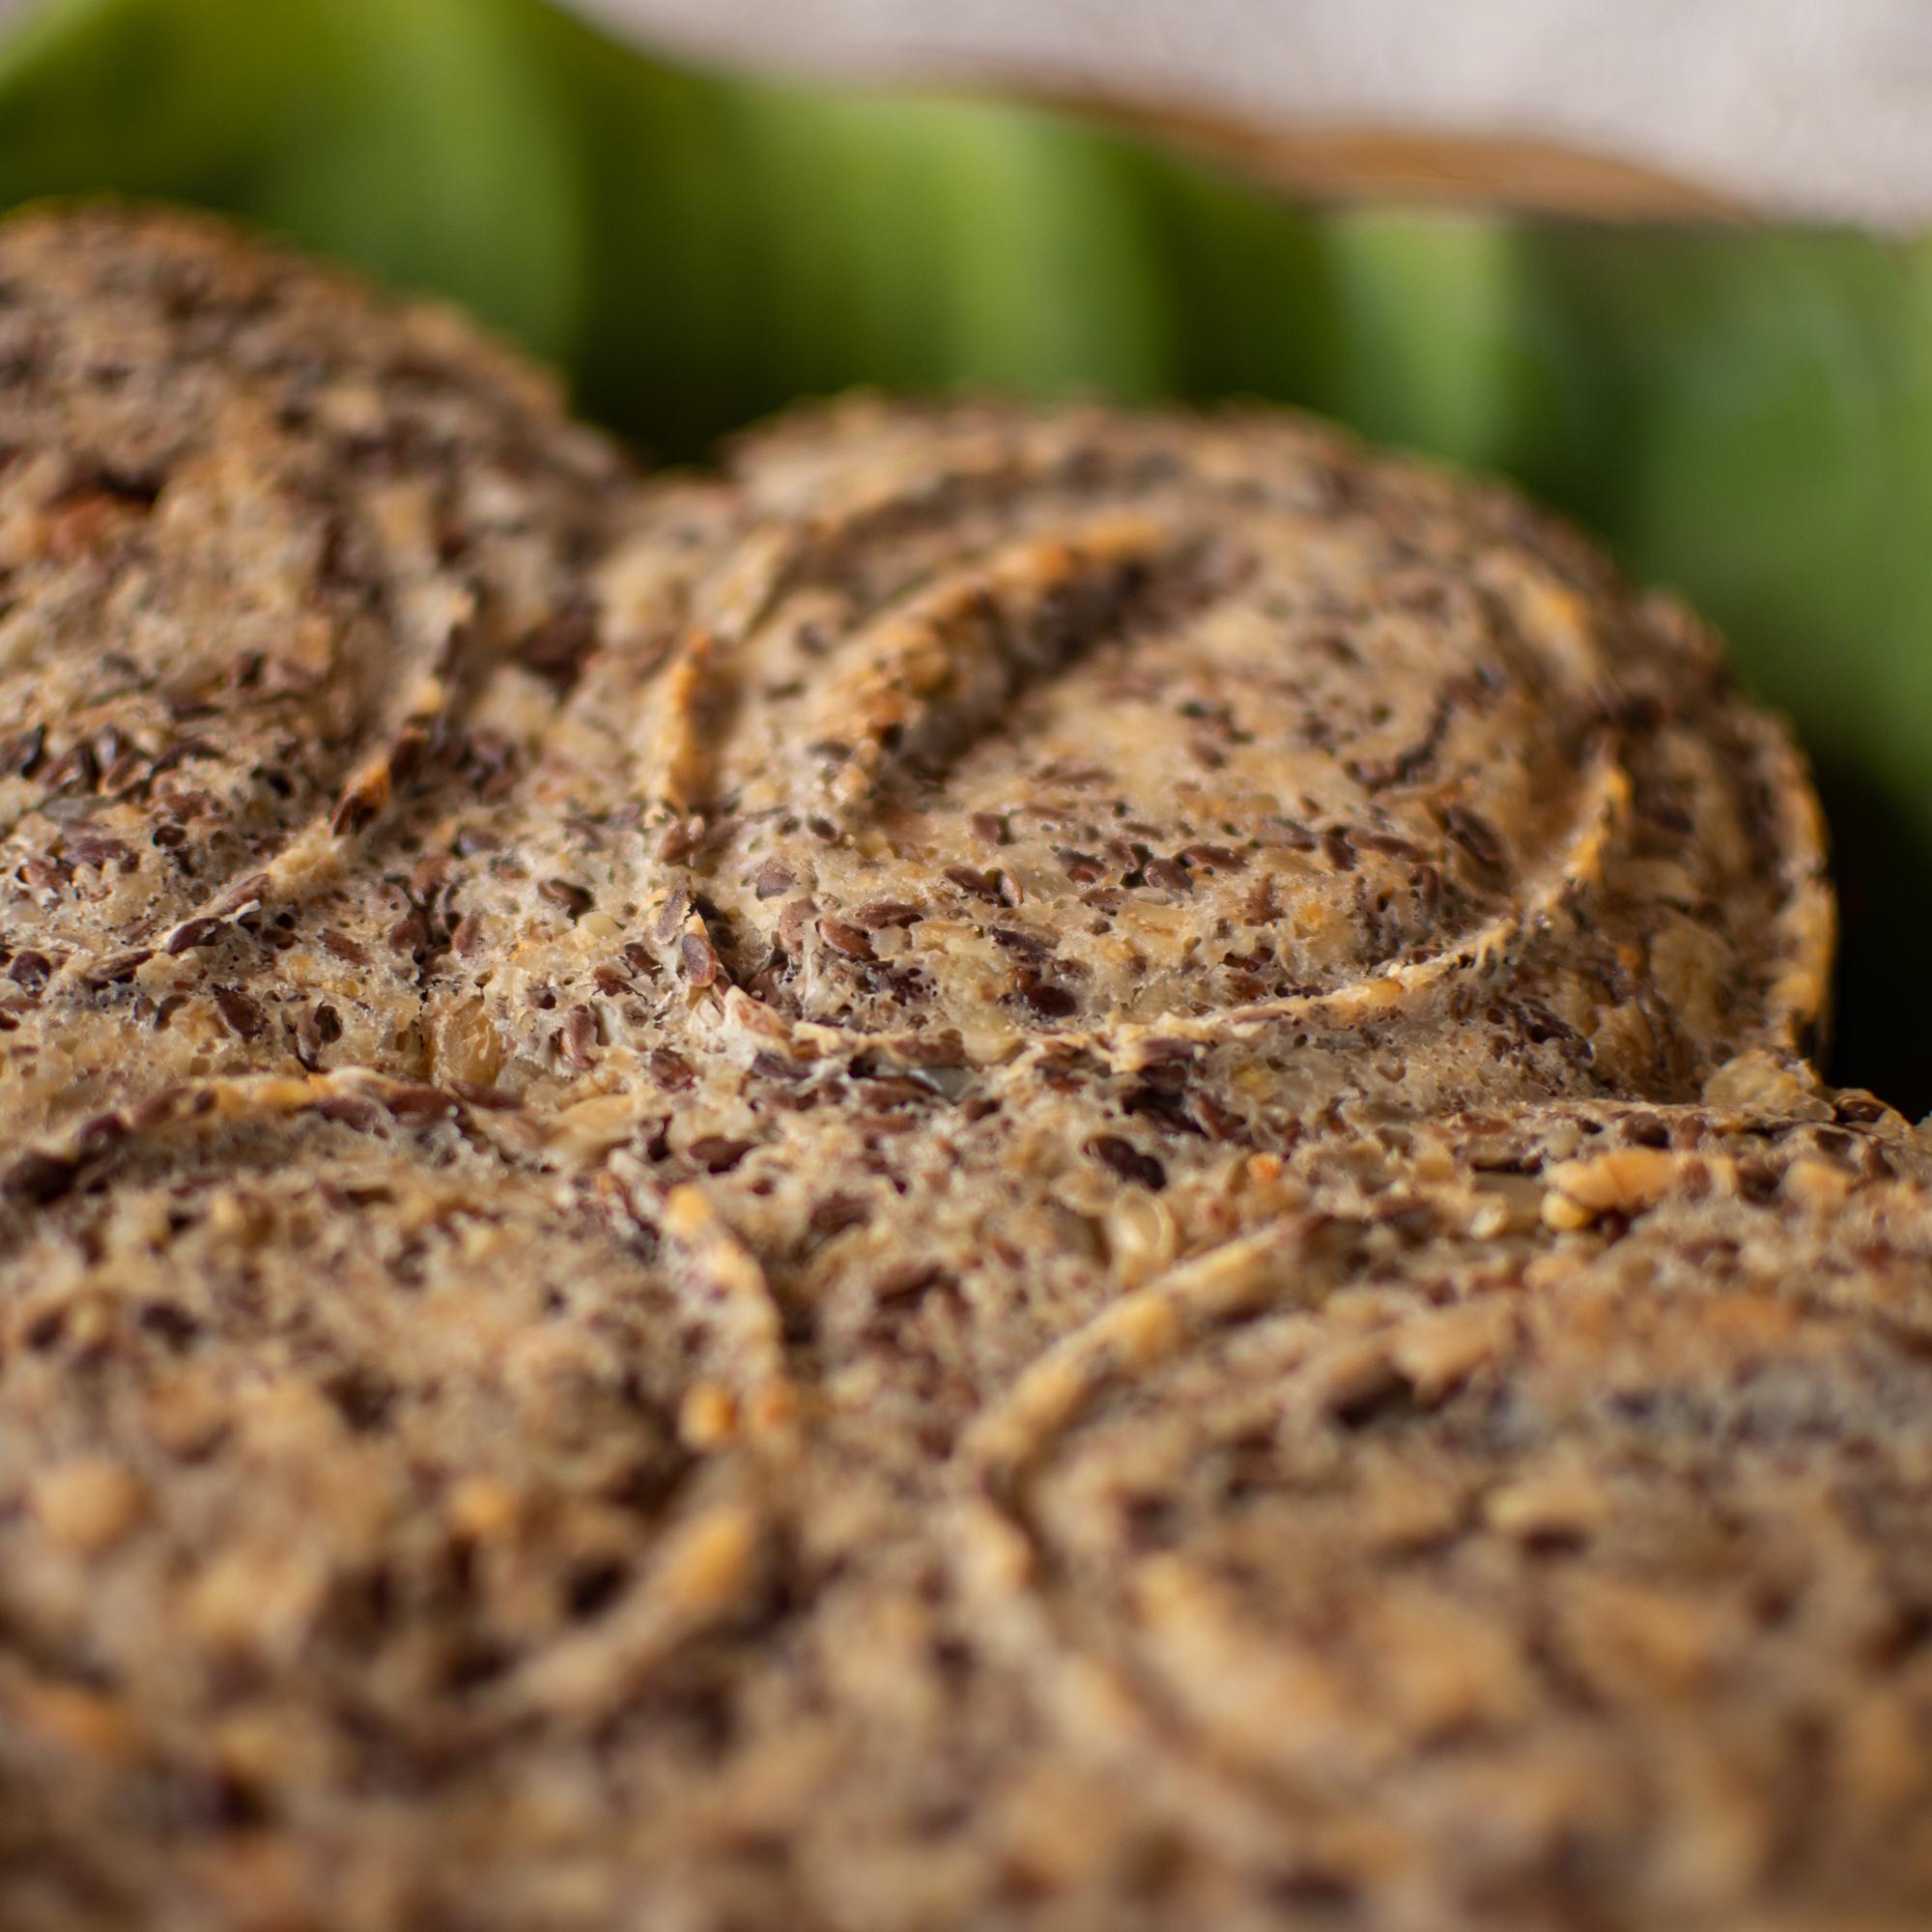 Farmfresh Vegetables: Hilde S Most Amazing Flour-Less Nut-Seed-Bread, 800g